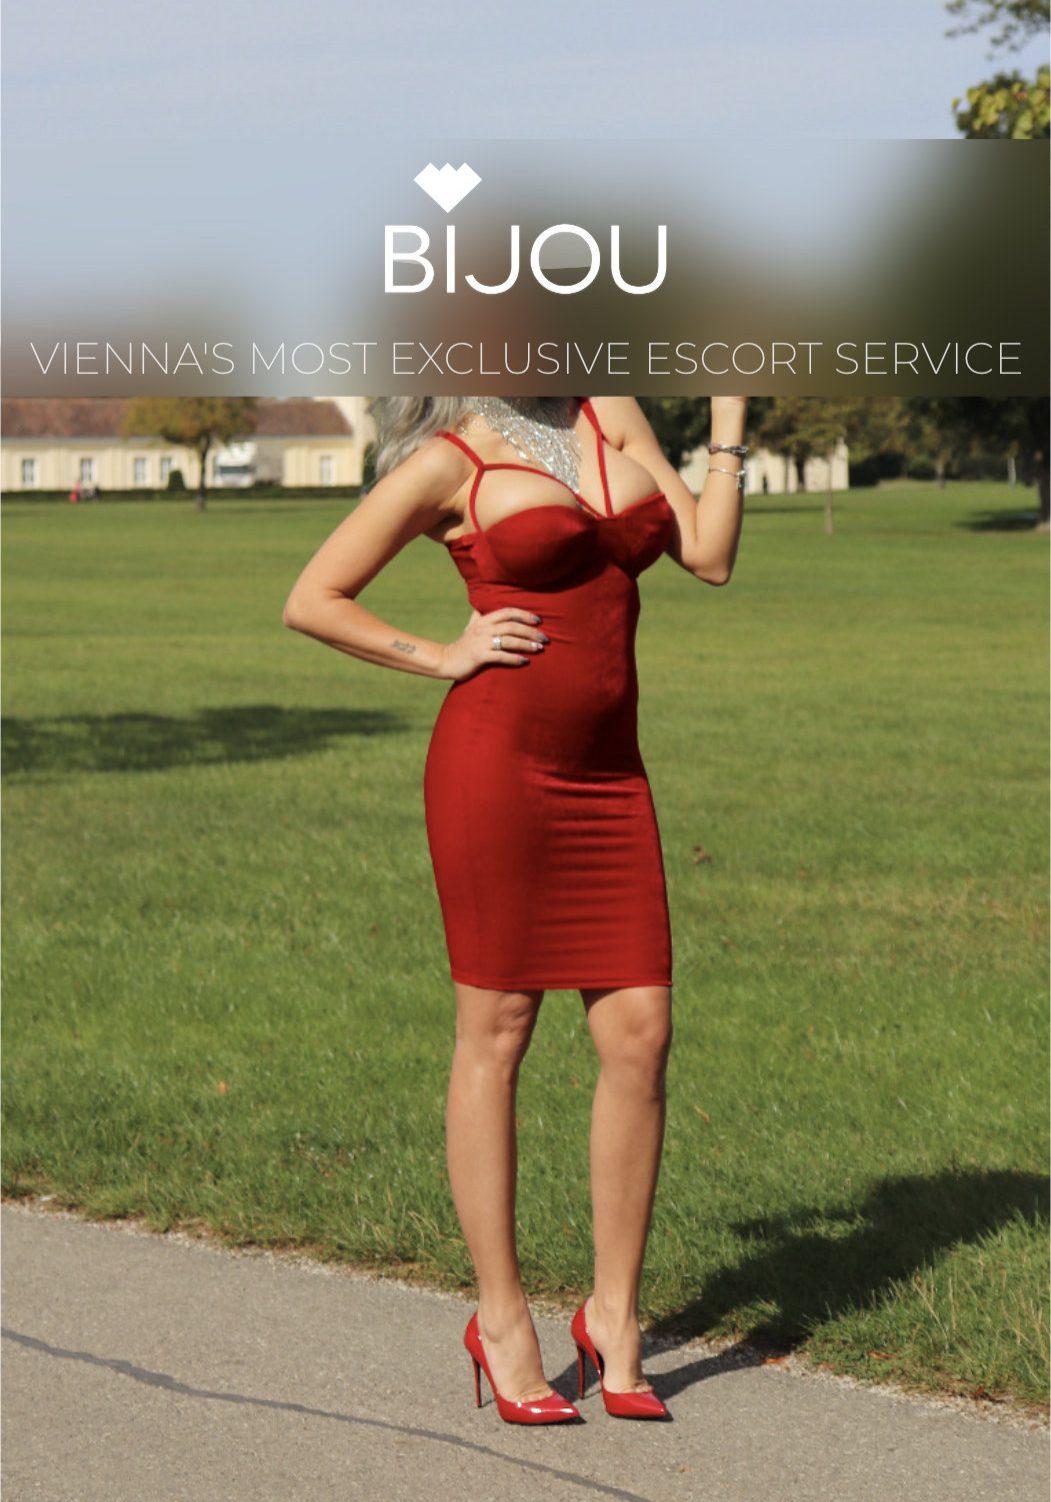 Bijou 1 marie